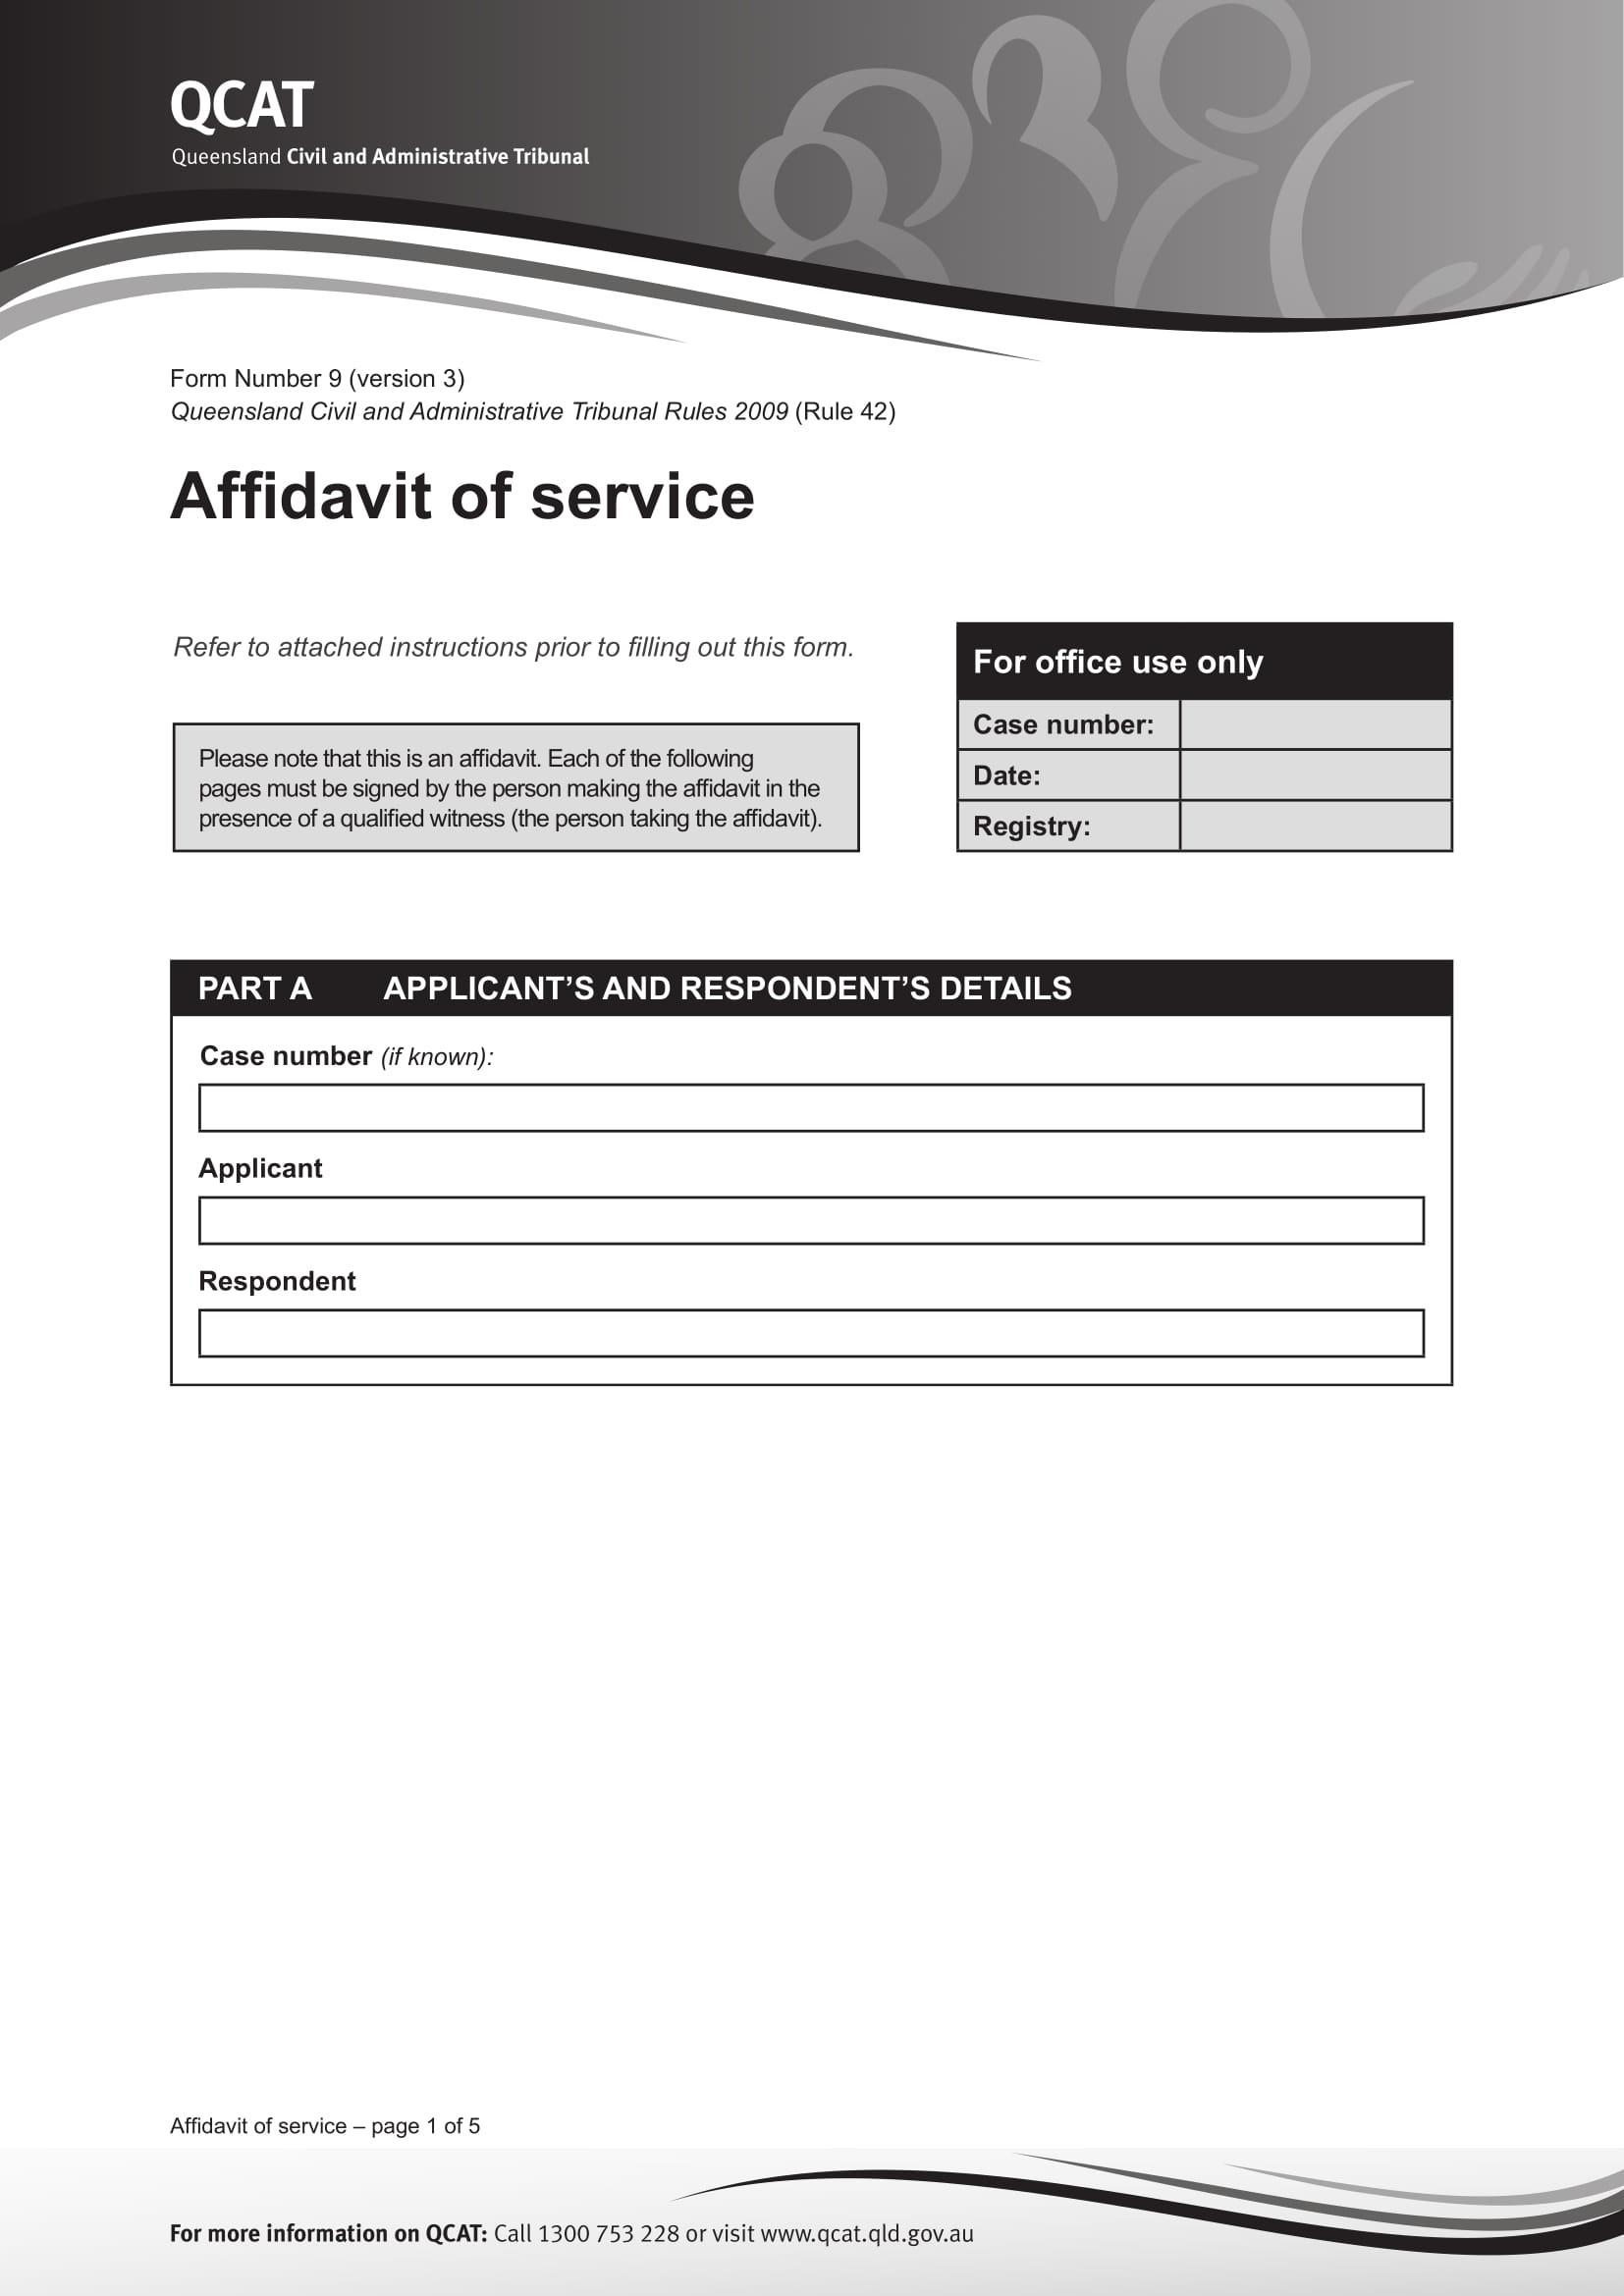 qcat affidavit of service